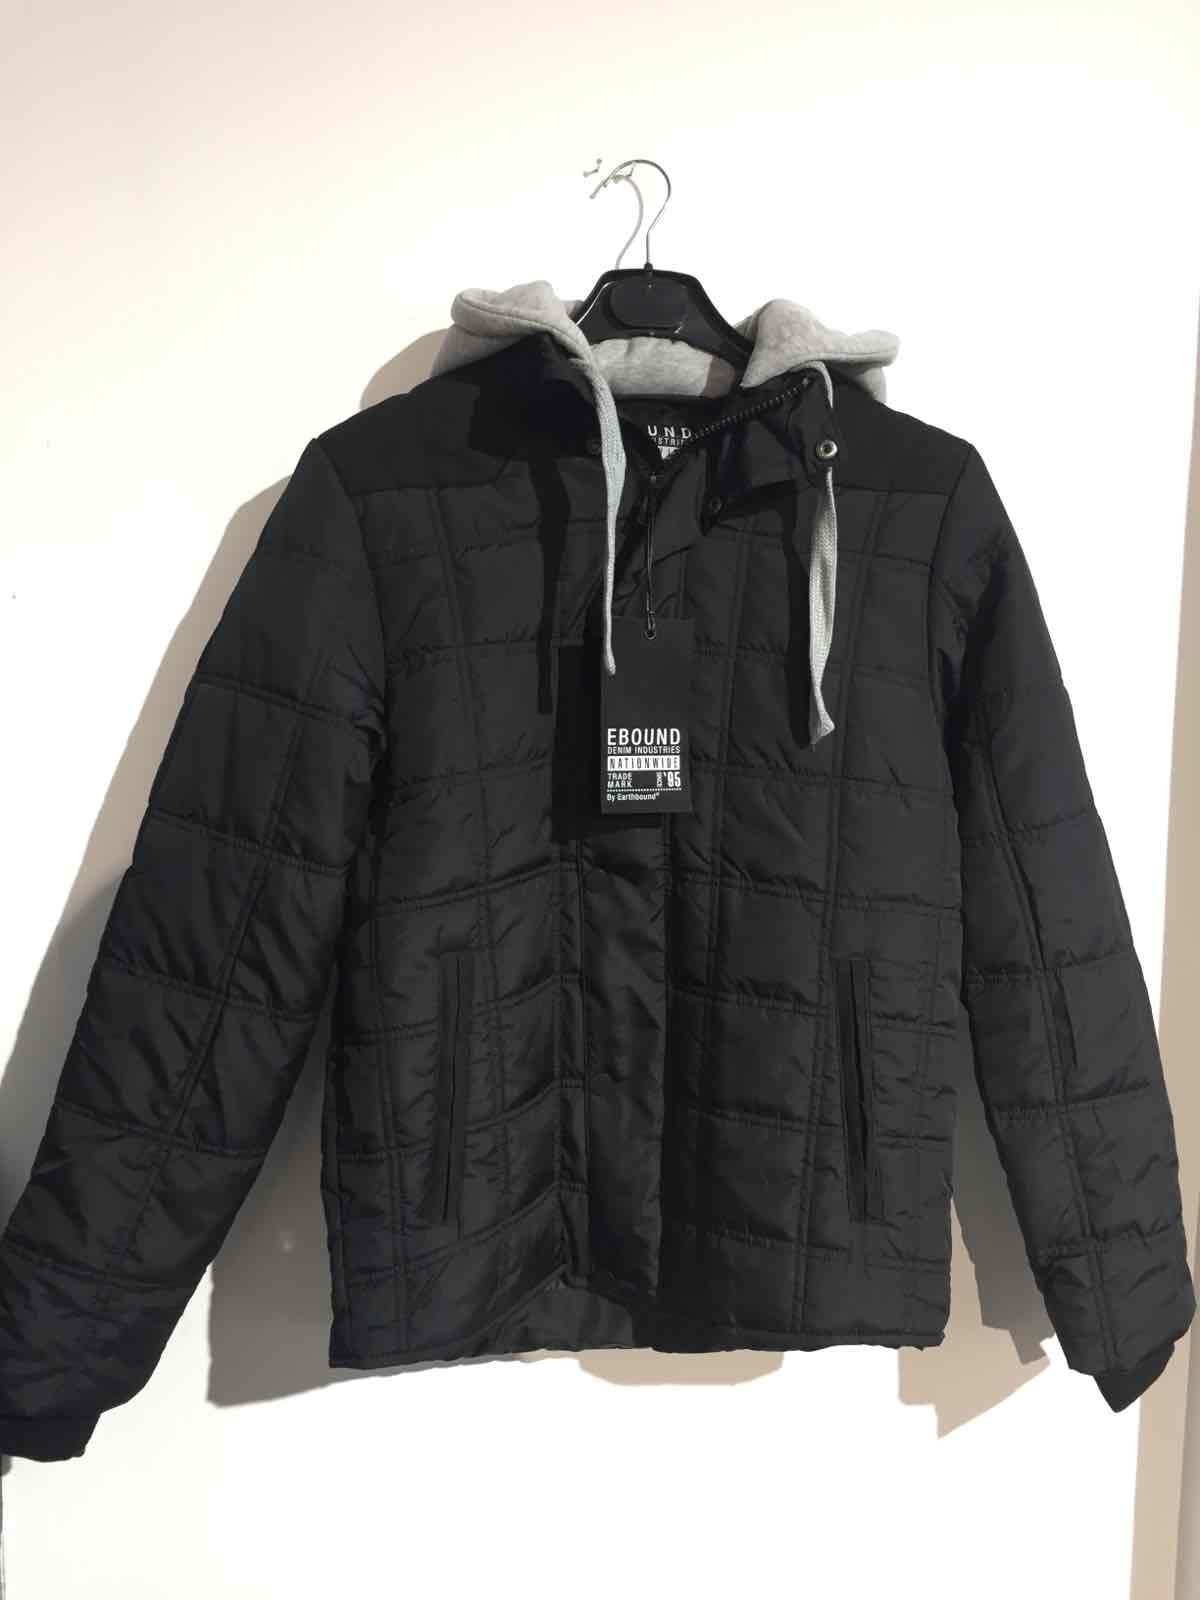 Fashion Ebound E Jacket BoundParis Shops qVSMpUzG